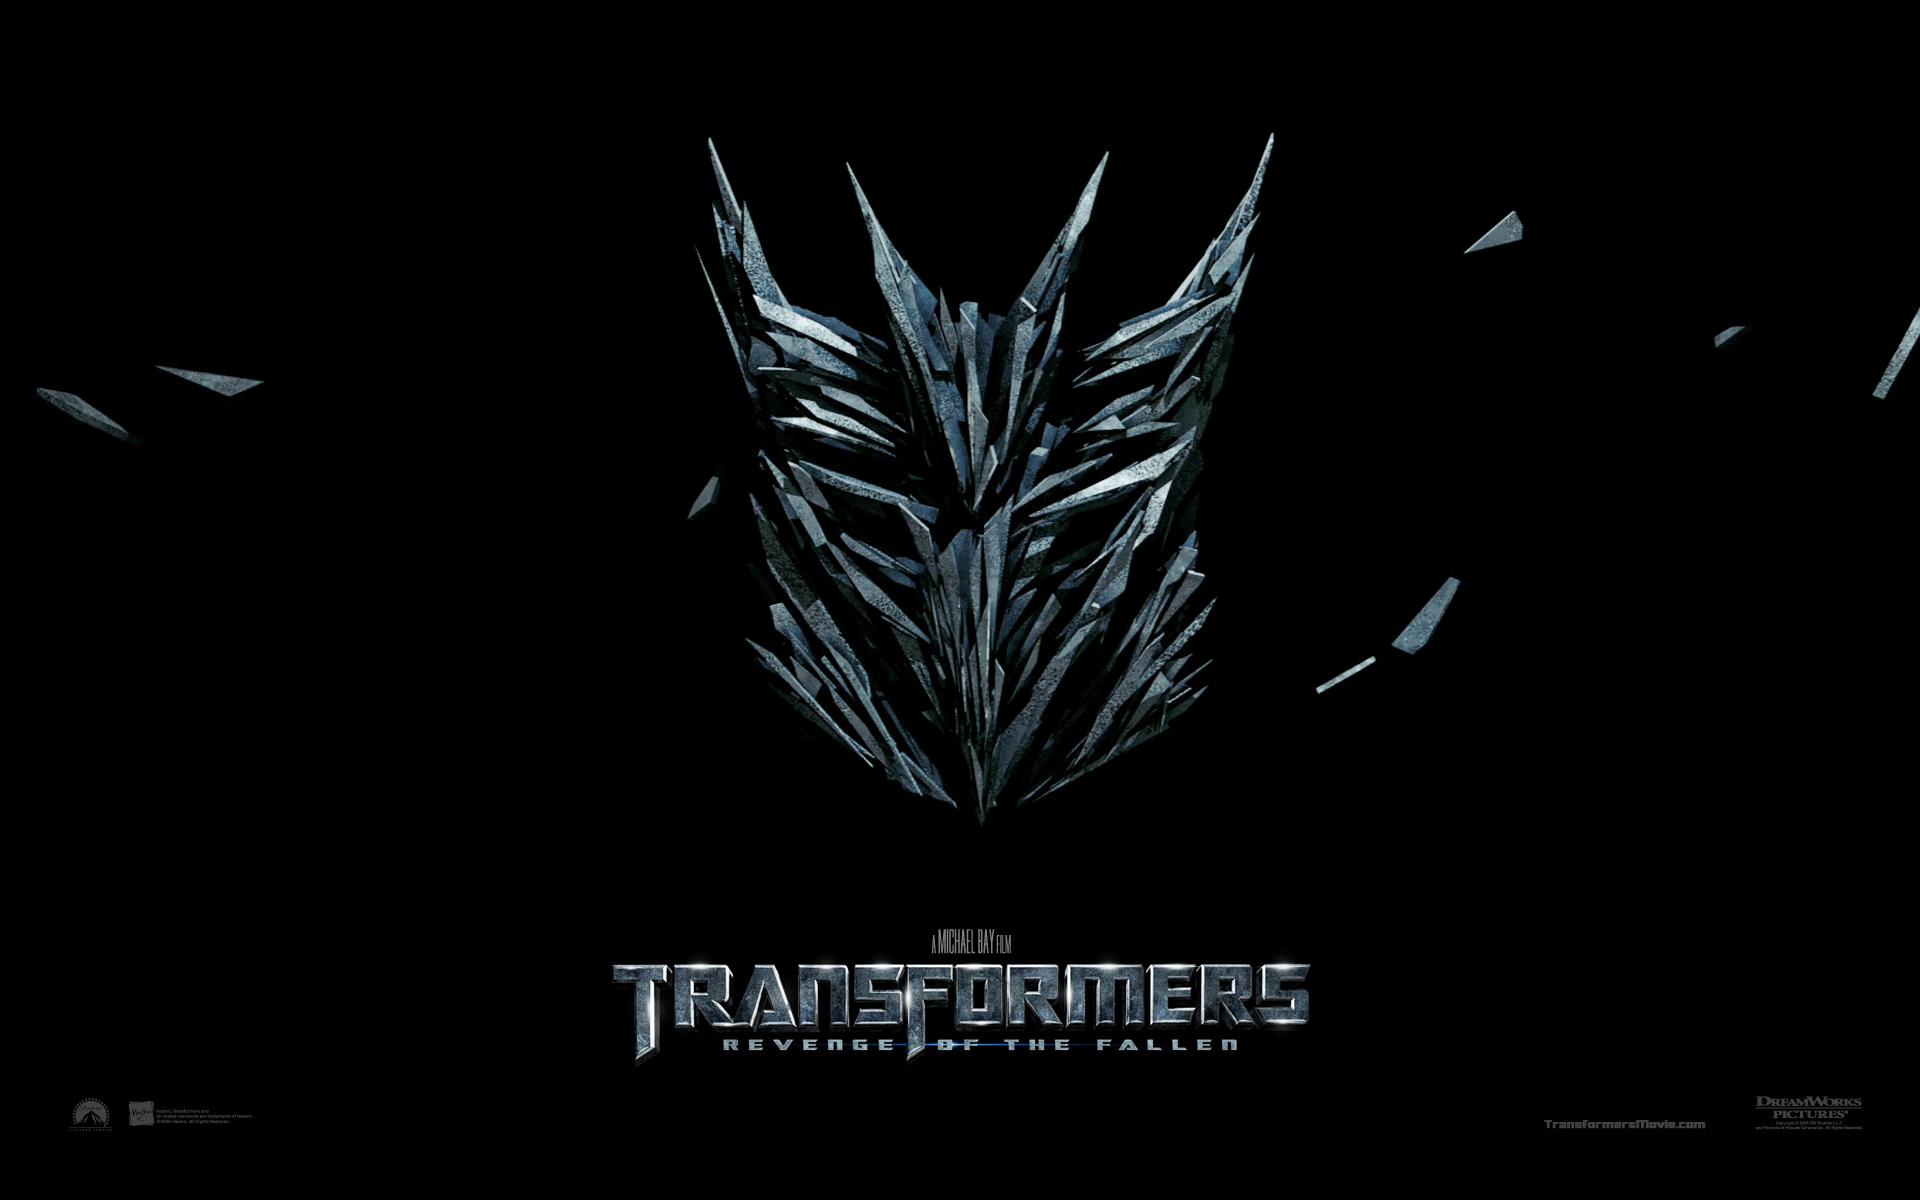 Kids n hintergrundbild transformers 2 - Transformers tapete ...